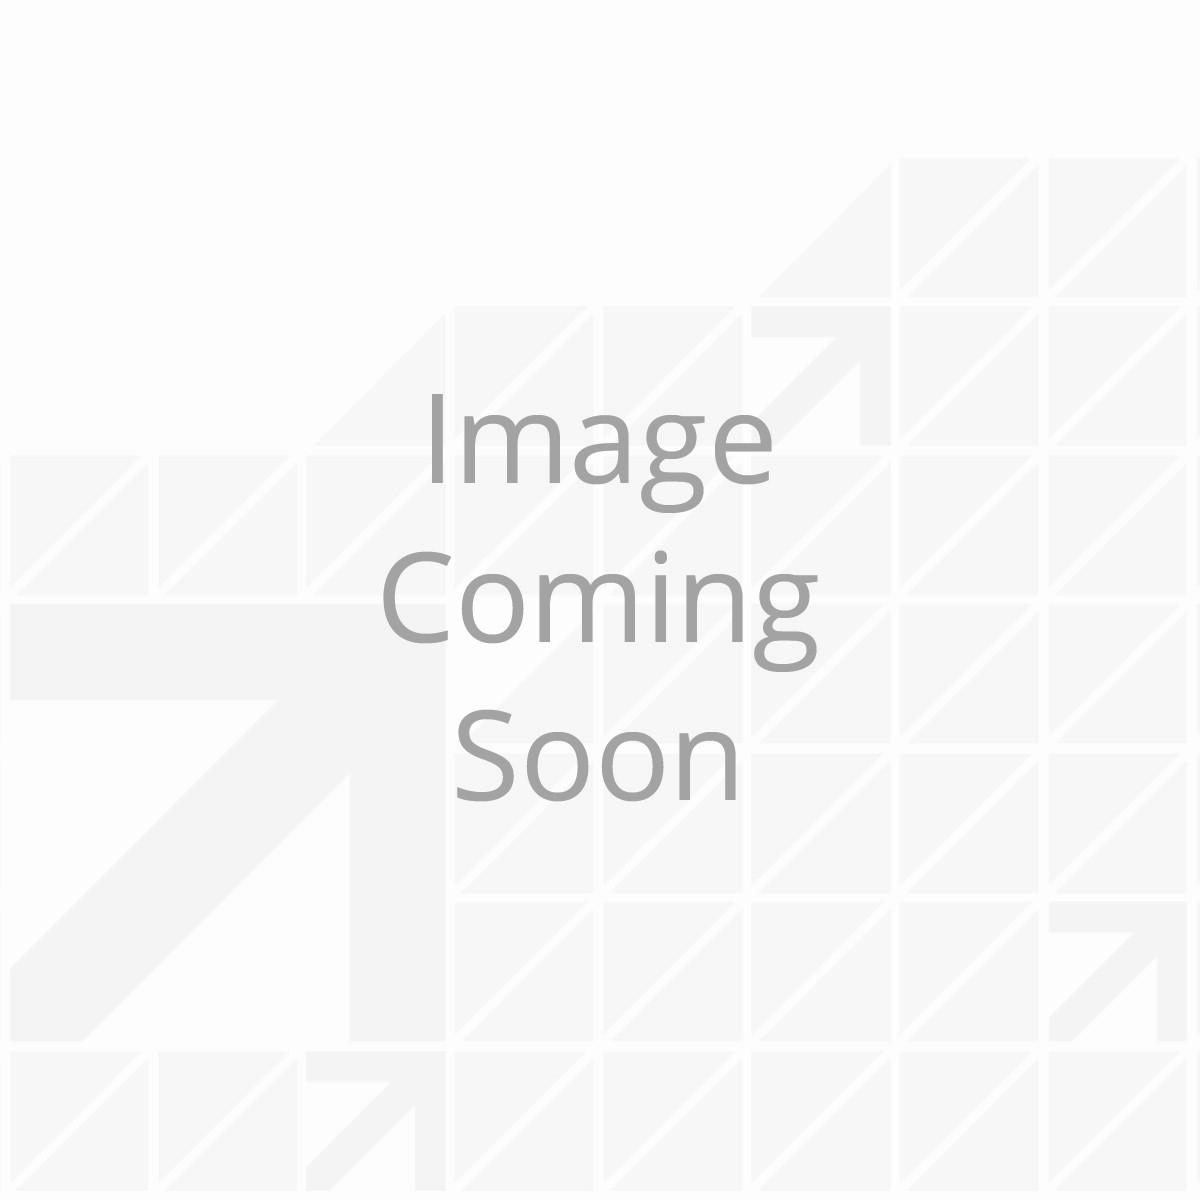 14' Power & Hybrid Awning Roller Assembly - Prepflex Black Fade